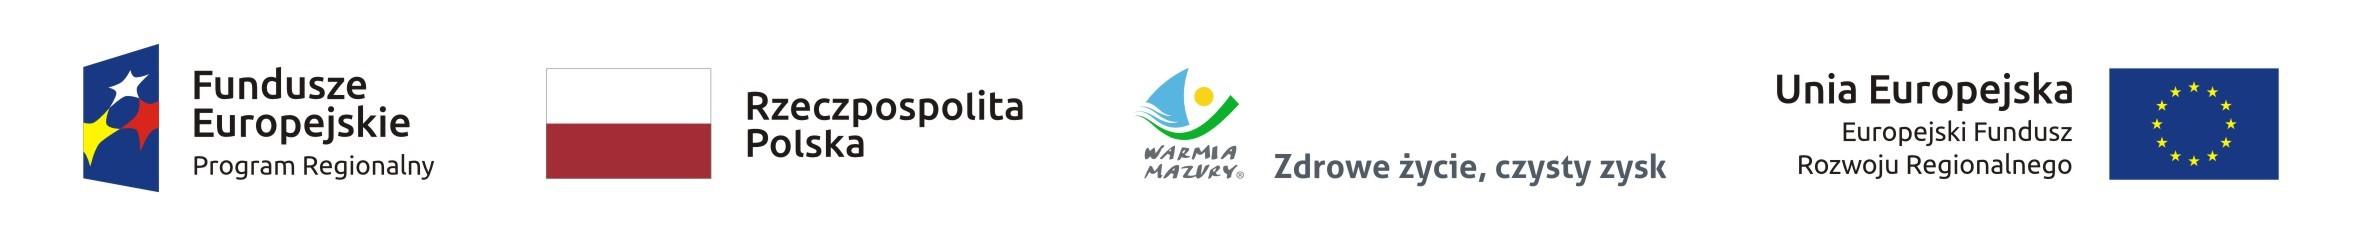 https://m.wmwm.pl/2021/10/orig/logo-7204.jpg